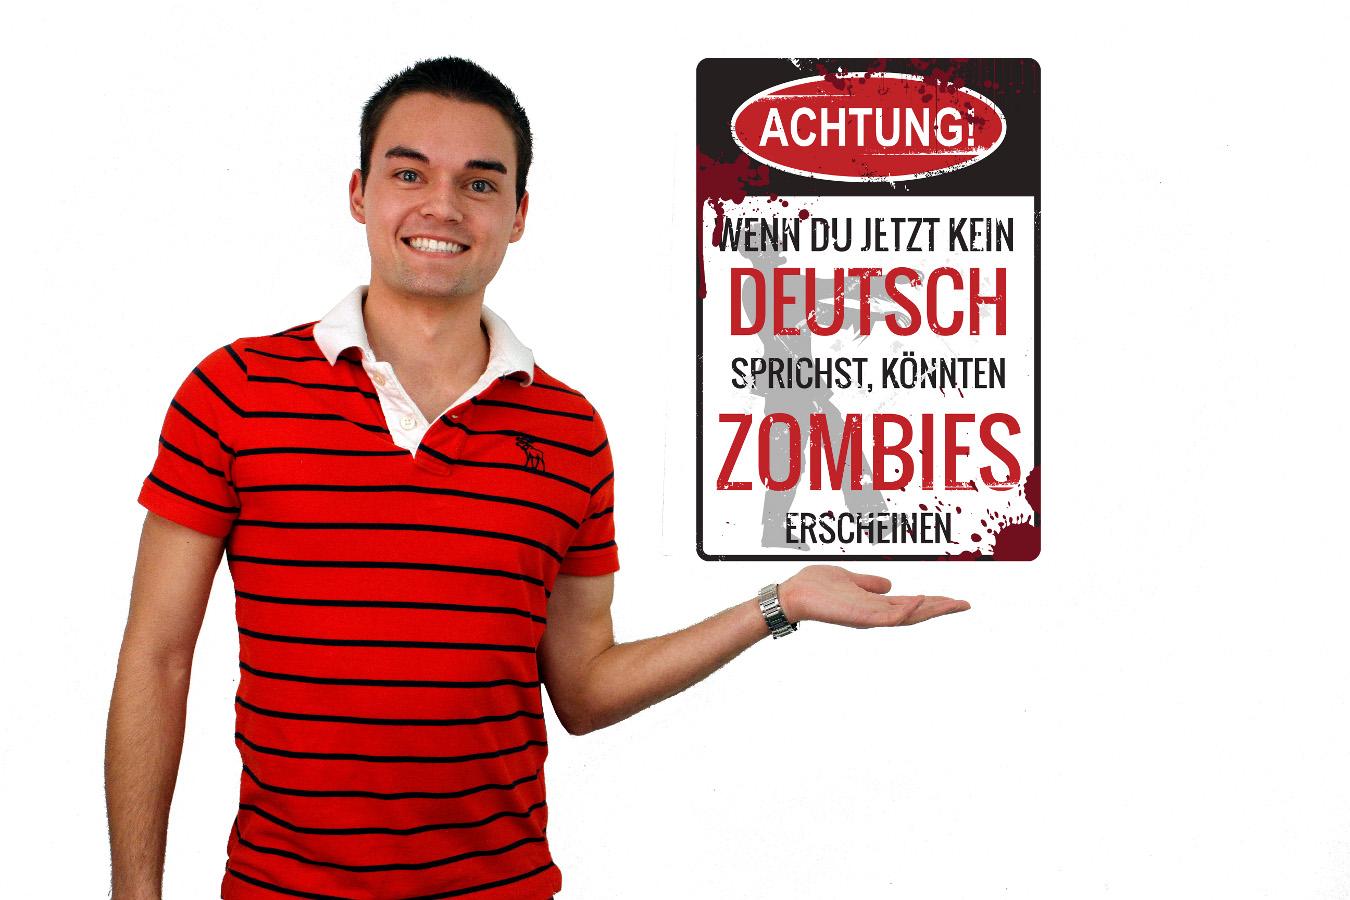 Conditional Tense German  Zombie Mini-Poster